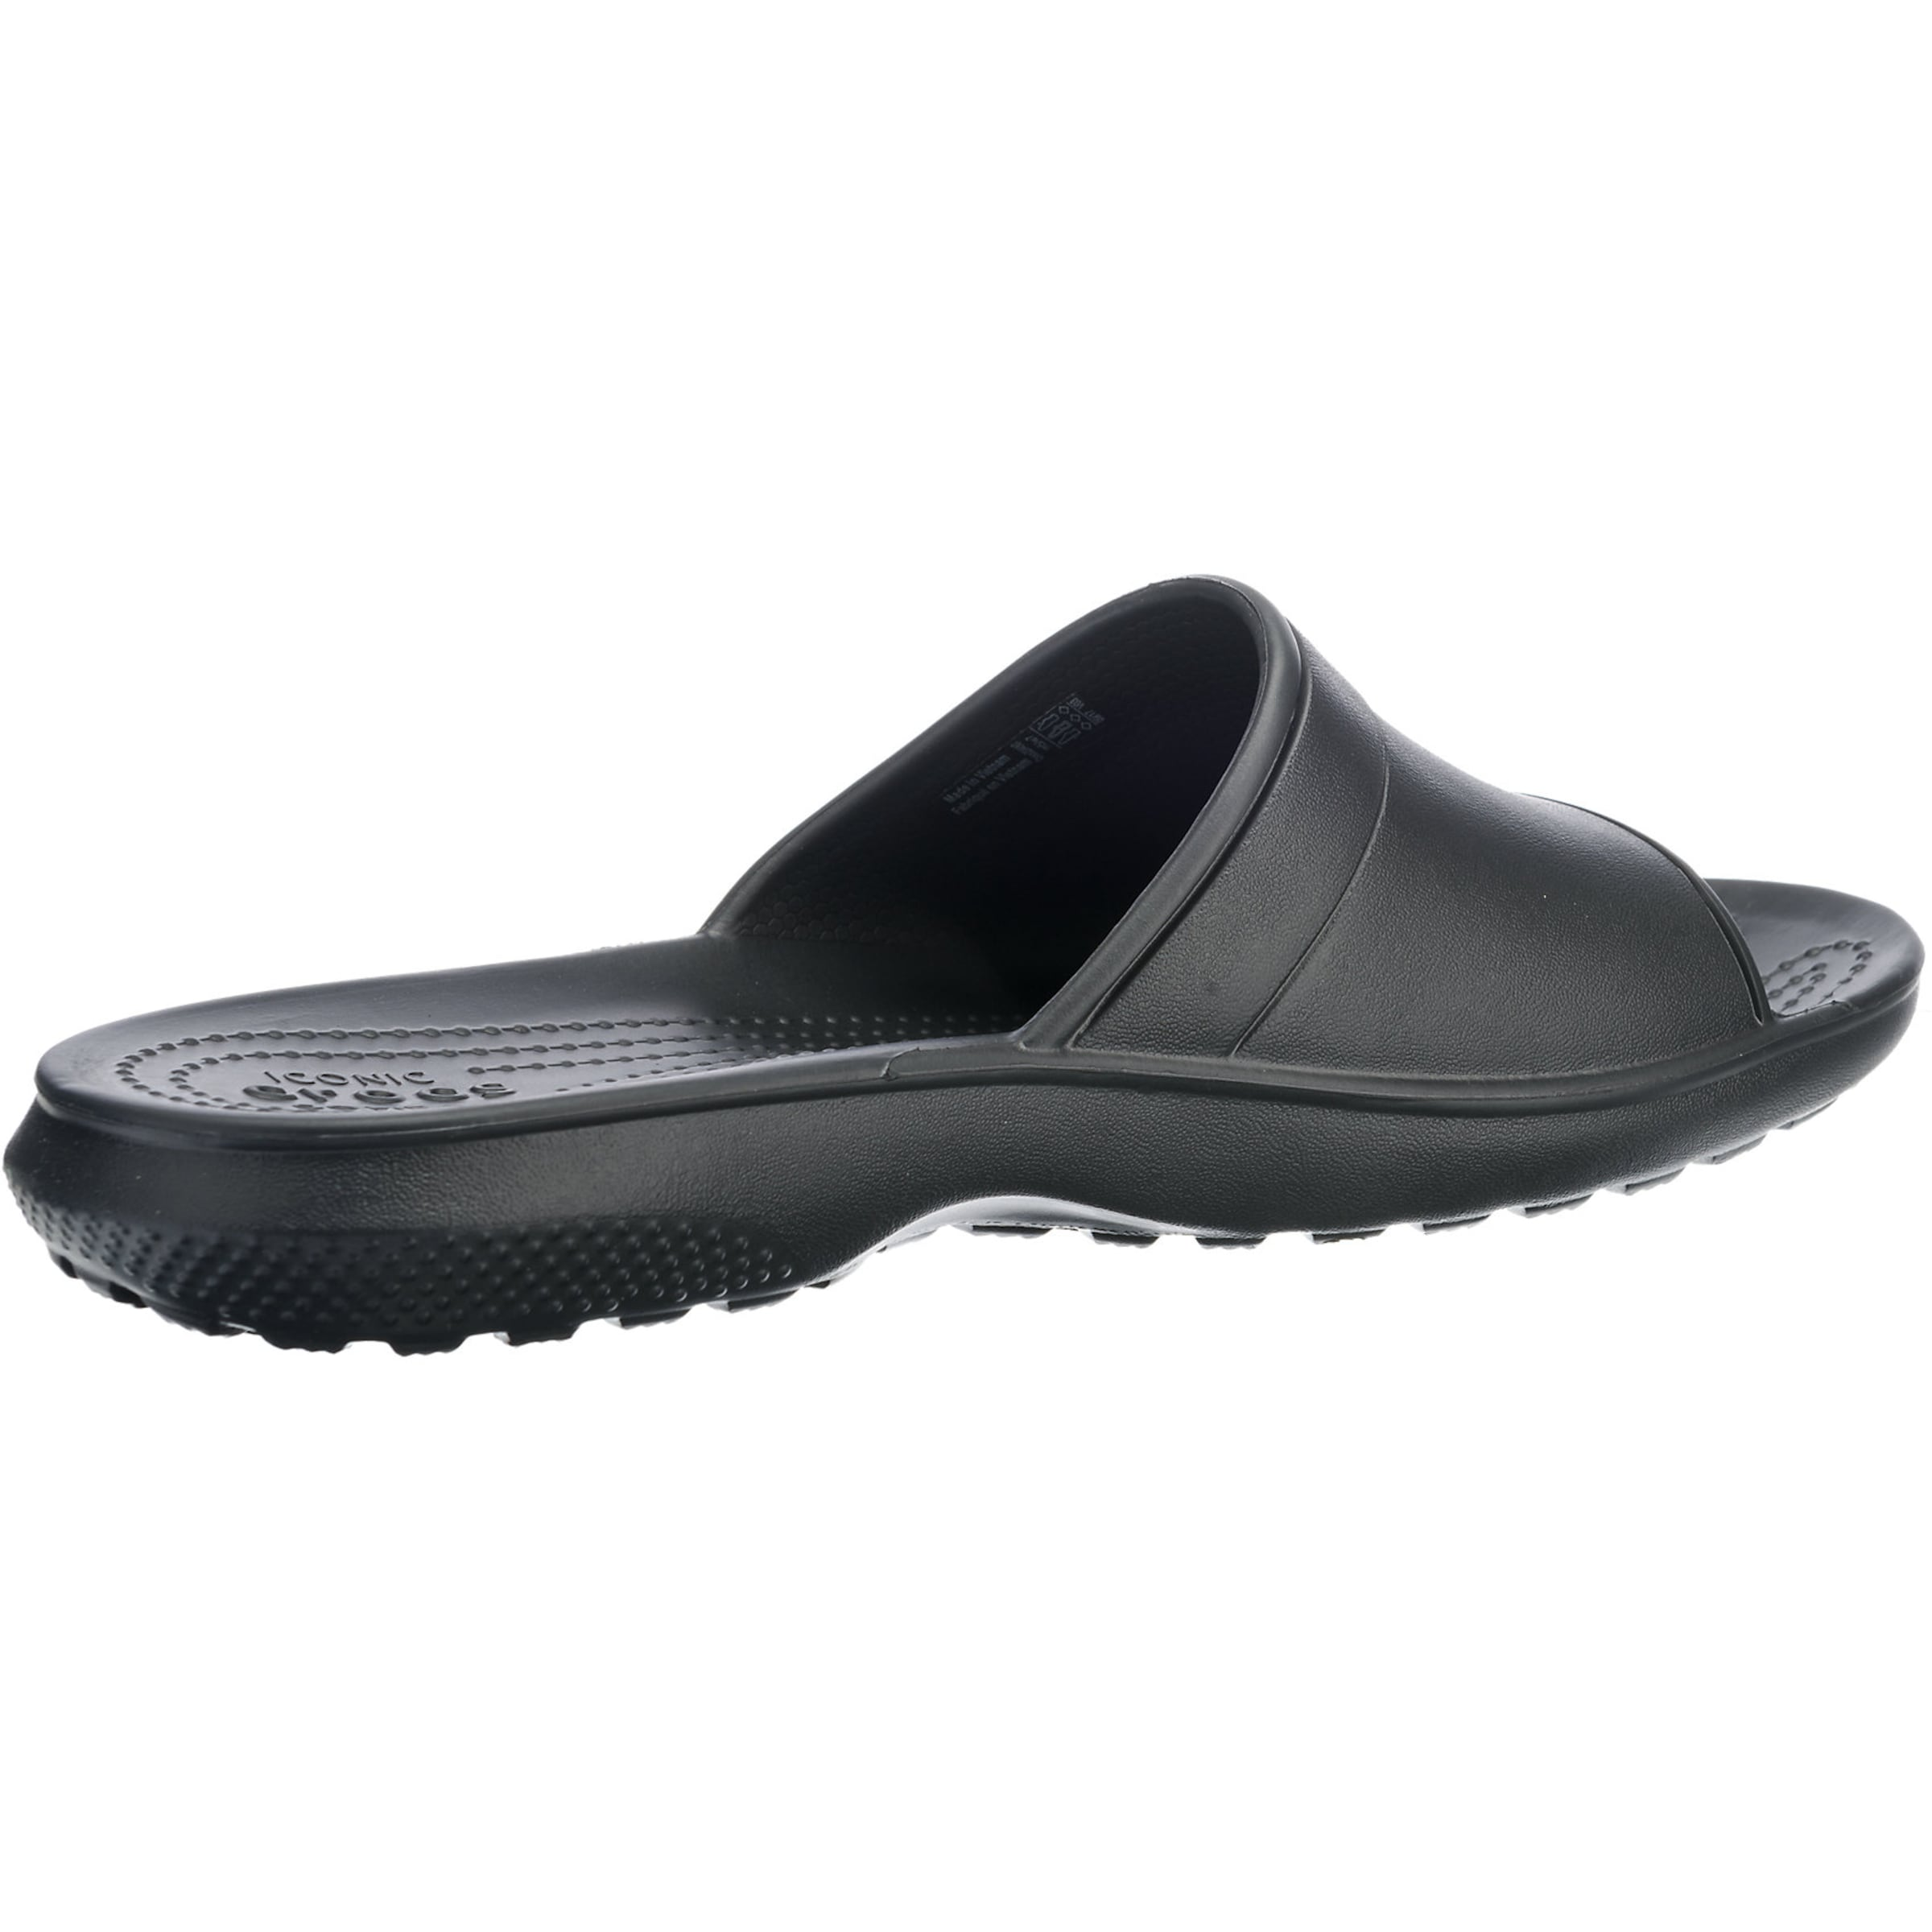 Crocs Komfort-Pantoletten 'Classic Slide' Rabatt Echt 0dgLyiuskf